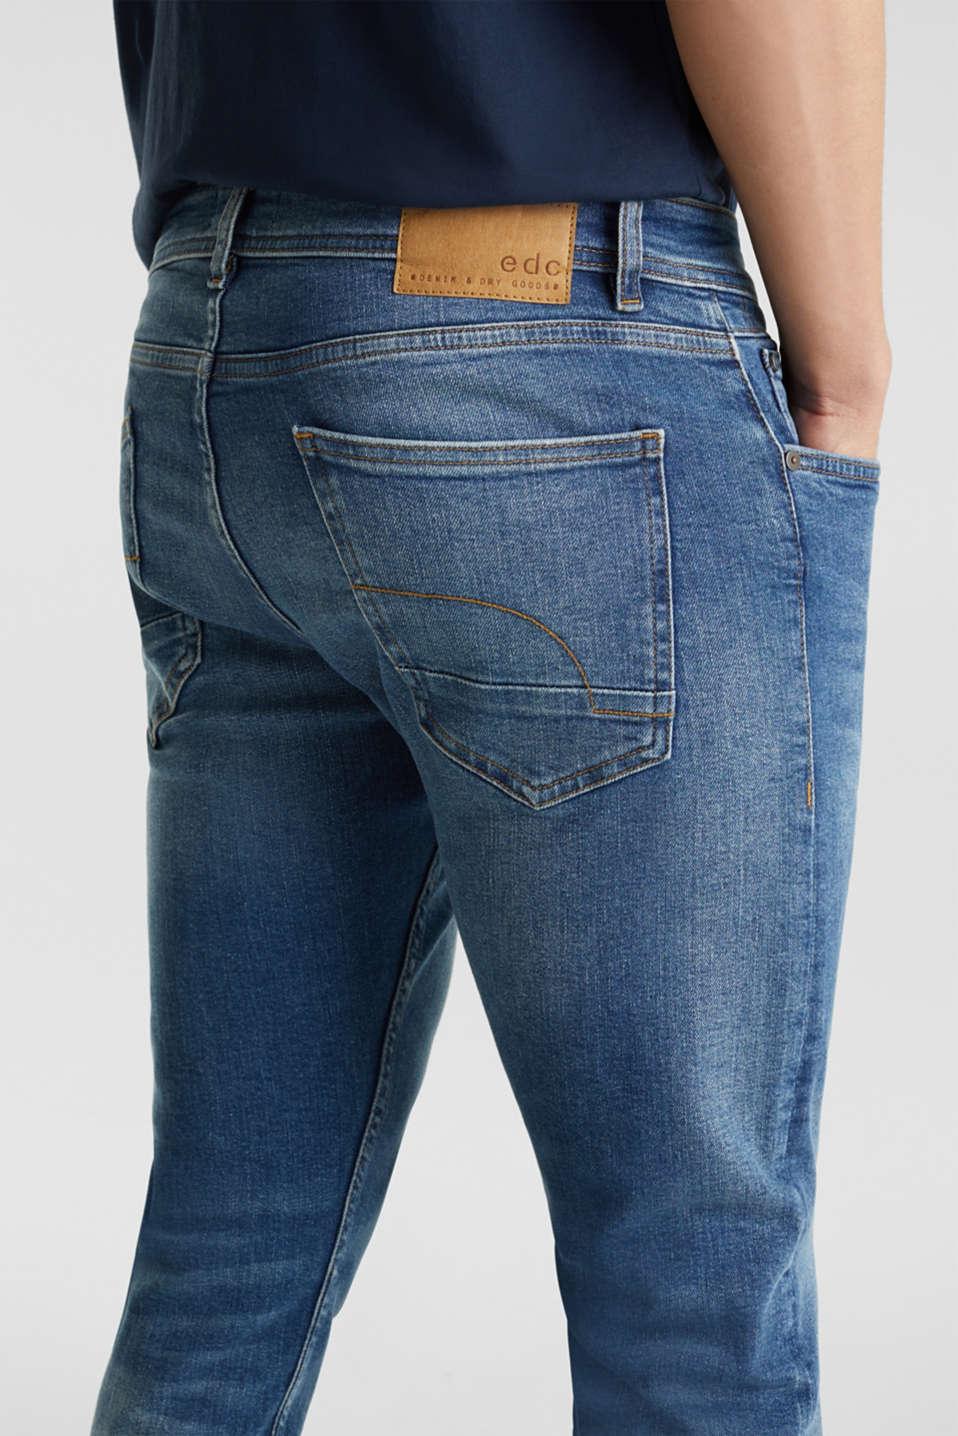 Pants denim Slim fit, BLUE MEDIUM WASH, detail image number 3